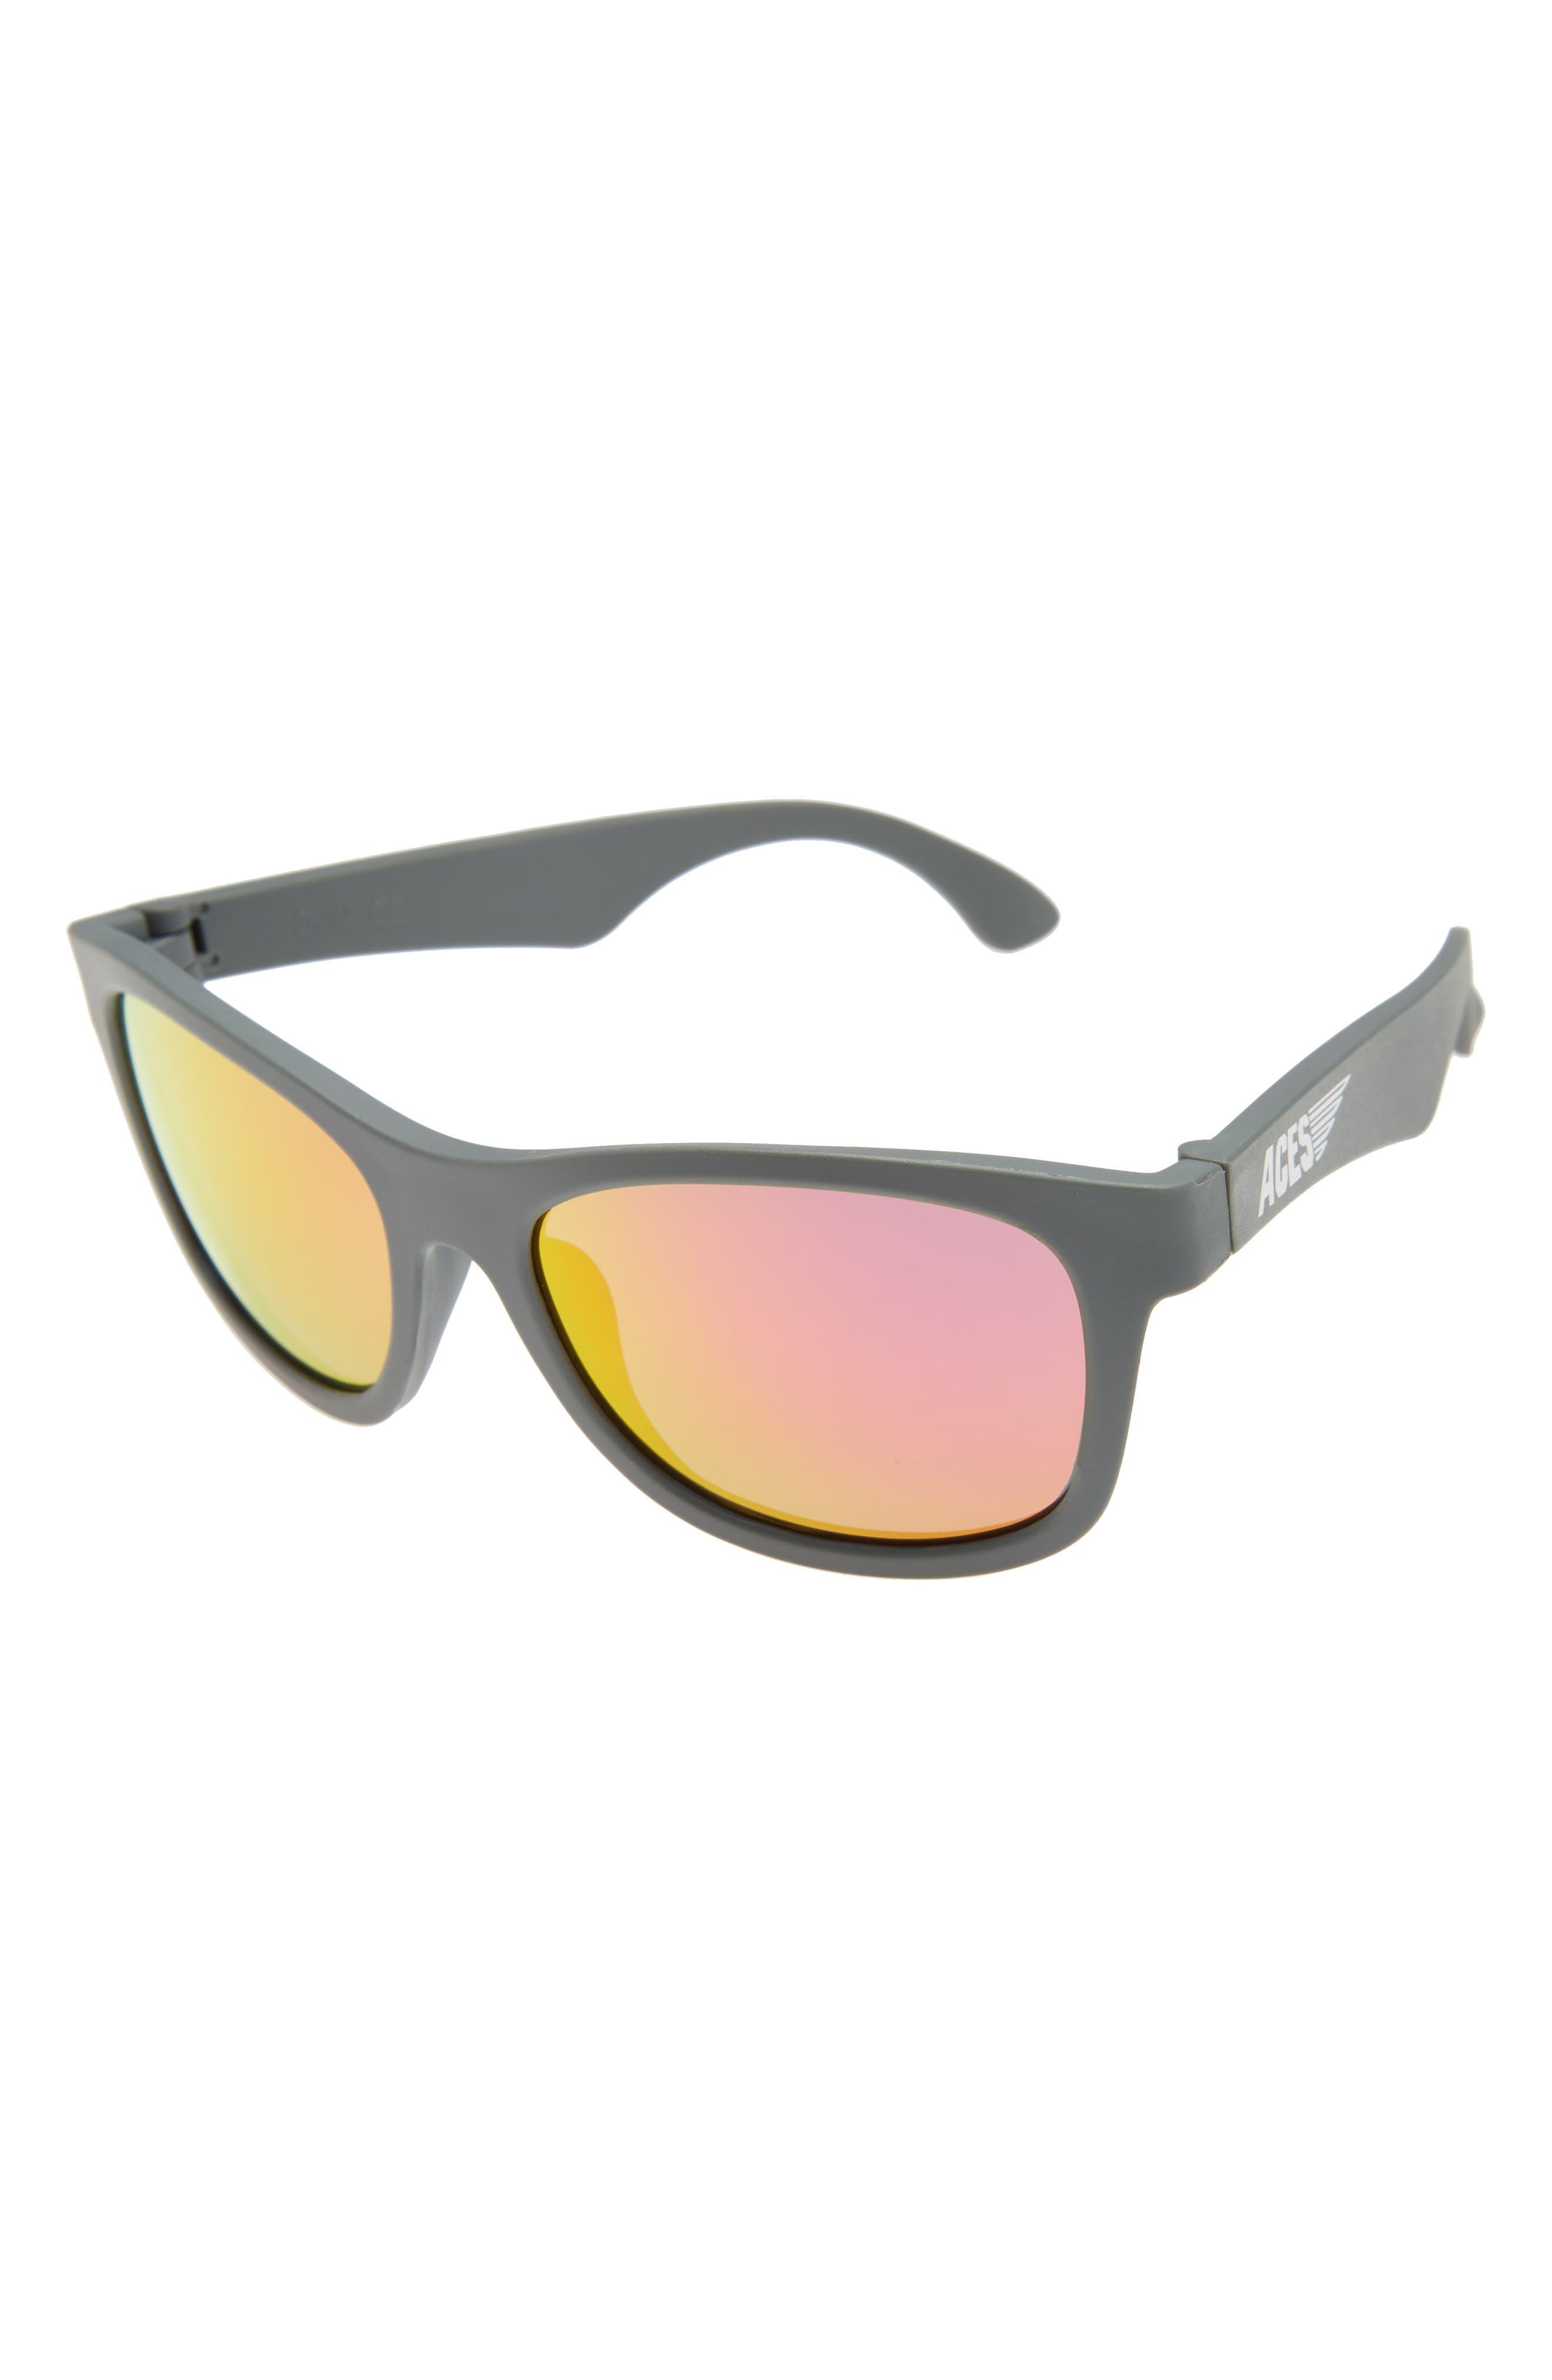 Aces Navigator Sunglasses,                         Main,                         color, 020